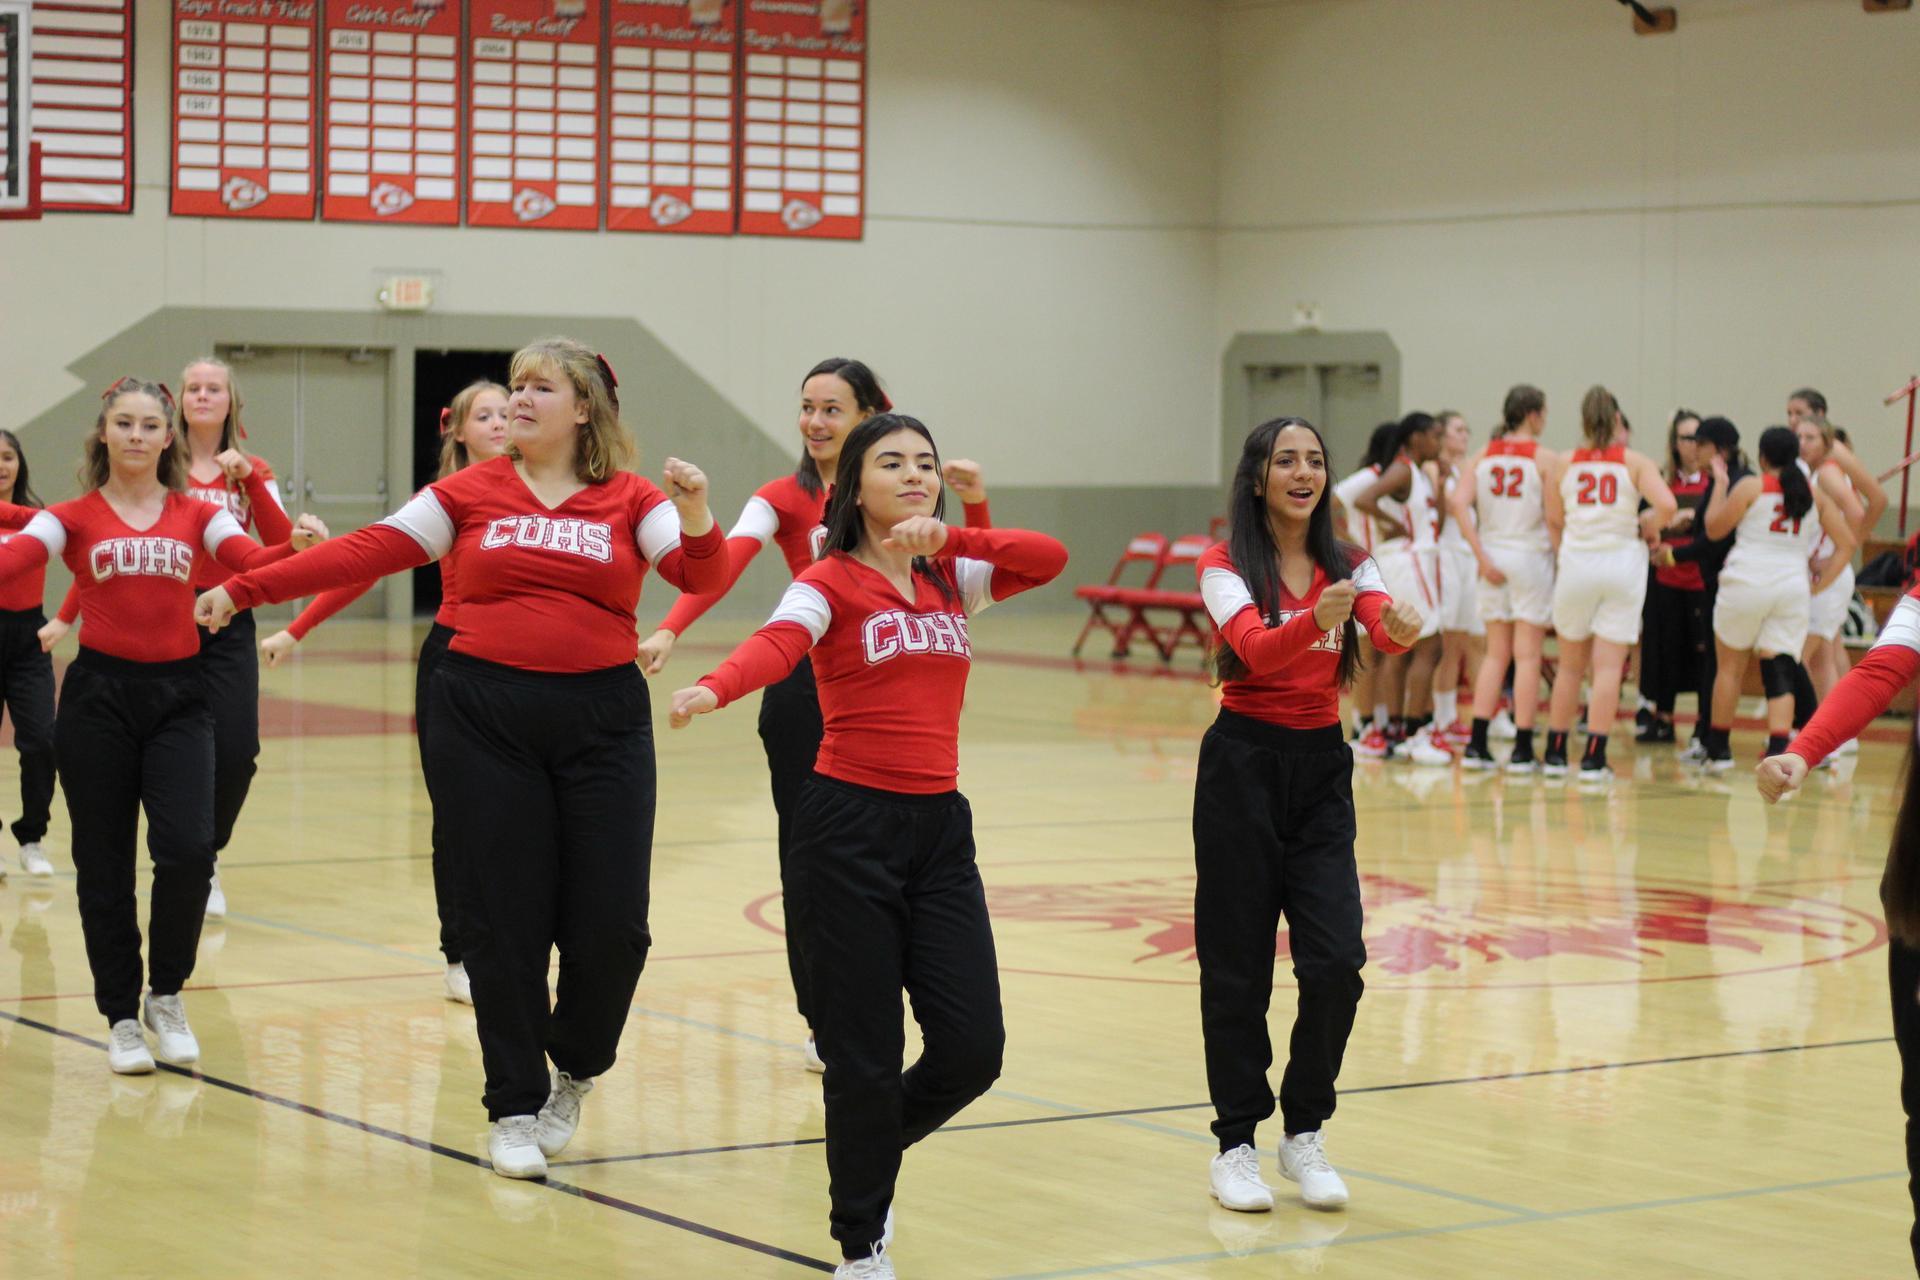 Tribe Cheer cheering